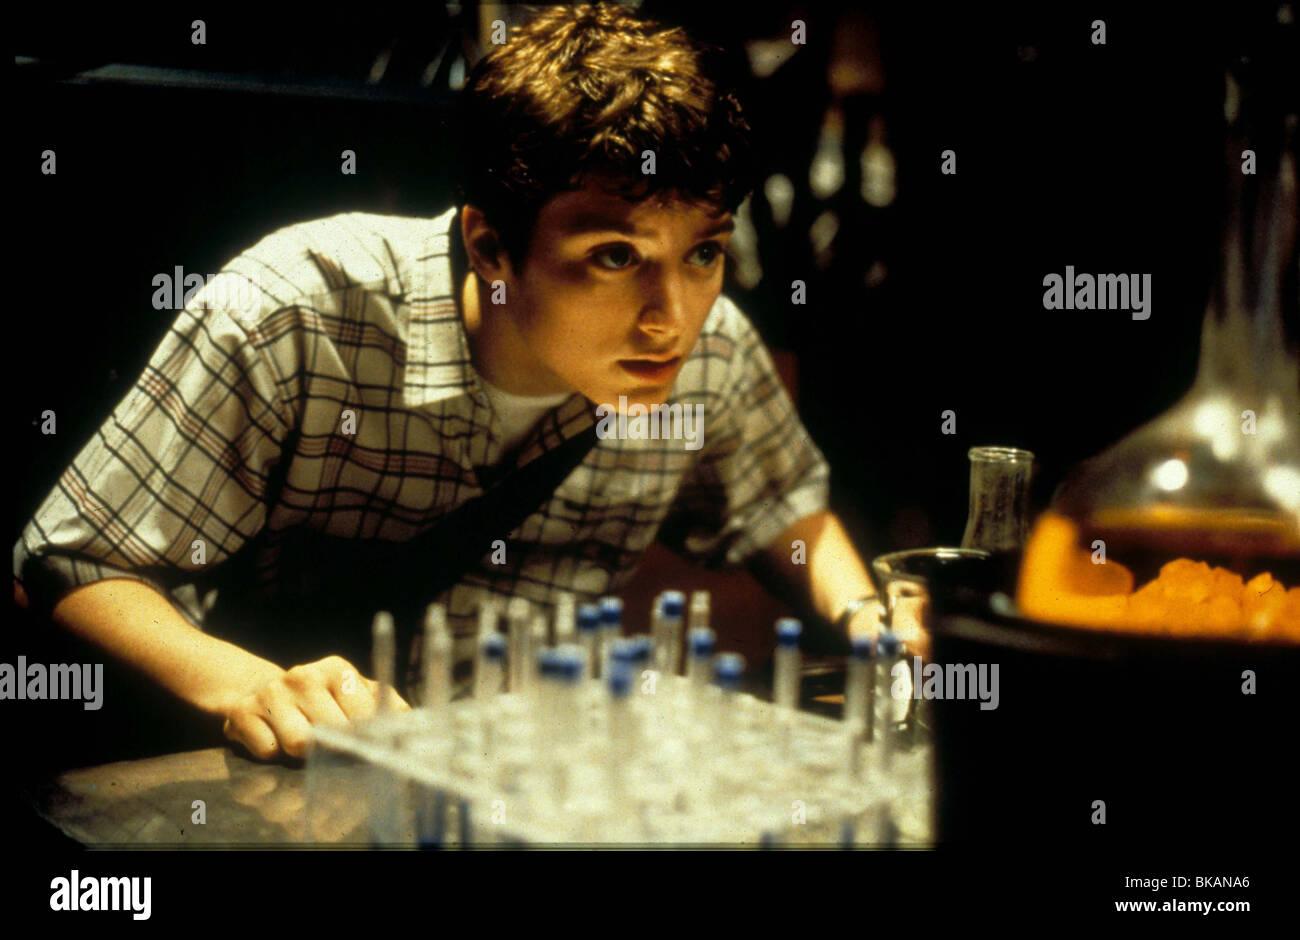 THE FACULTY -1999 ELIJAH WOOD - Stock Image